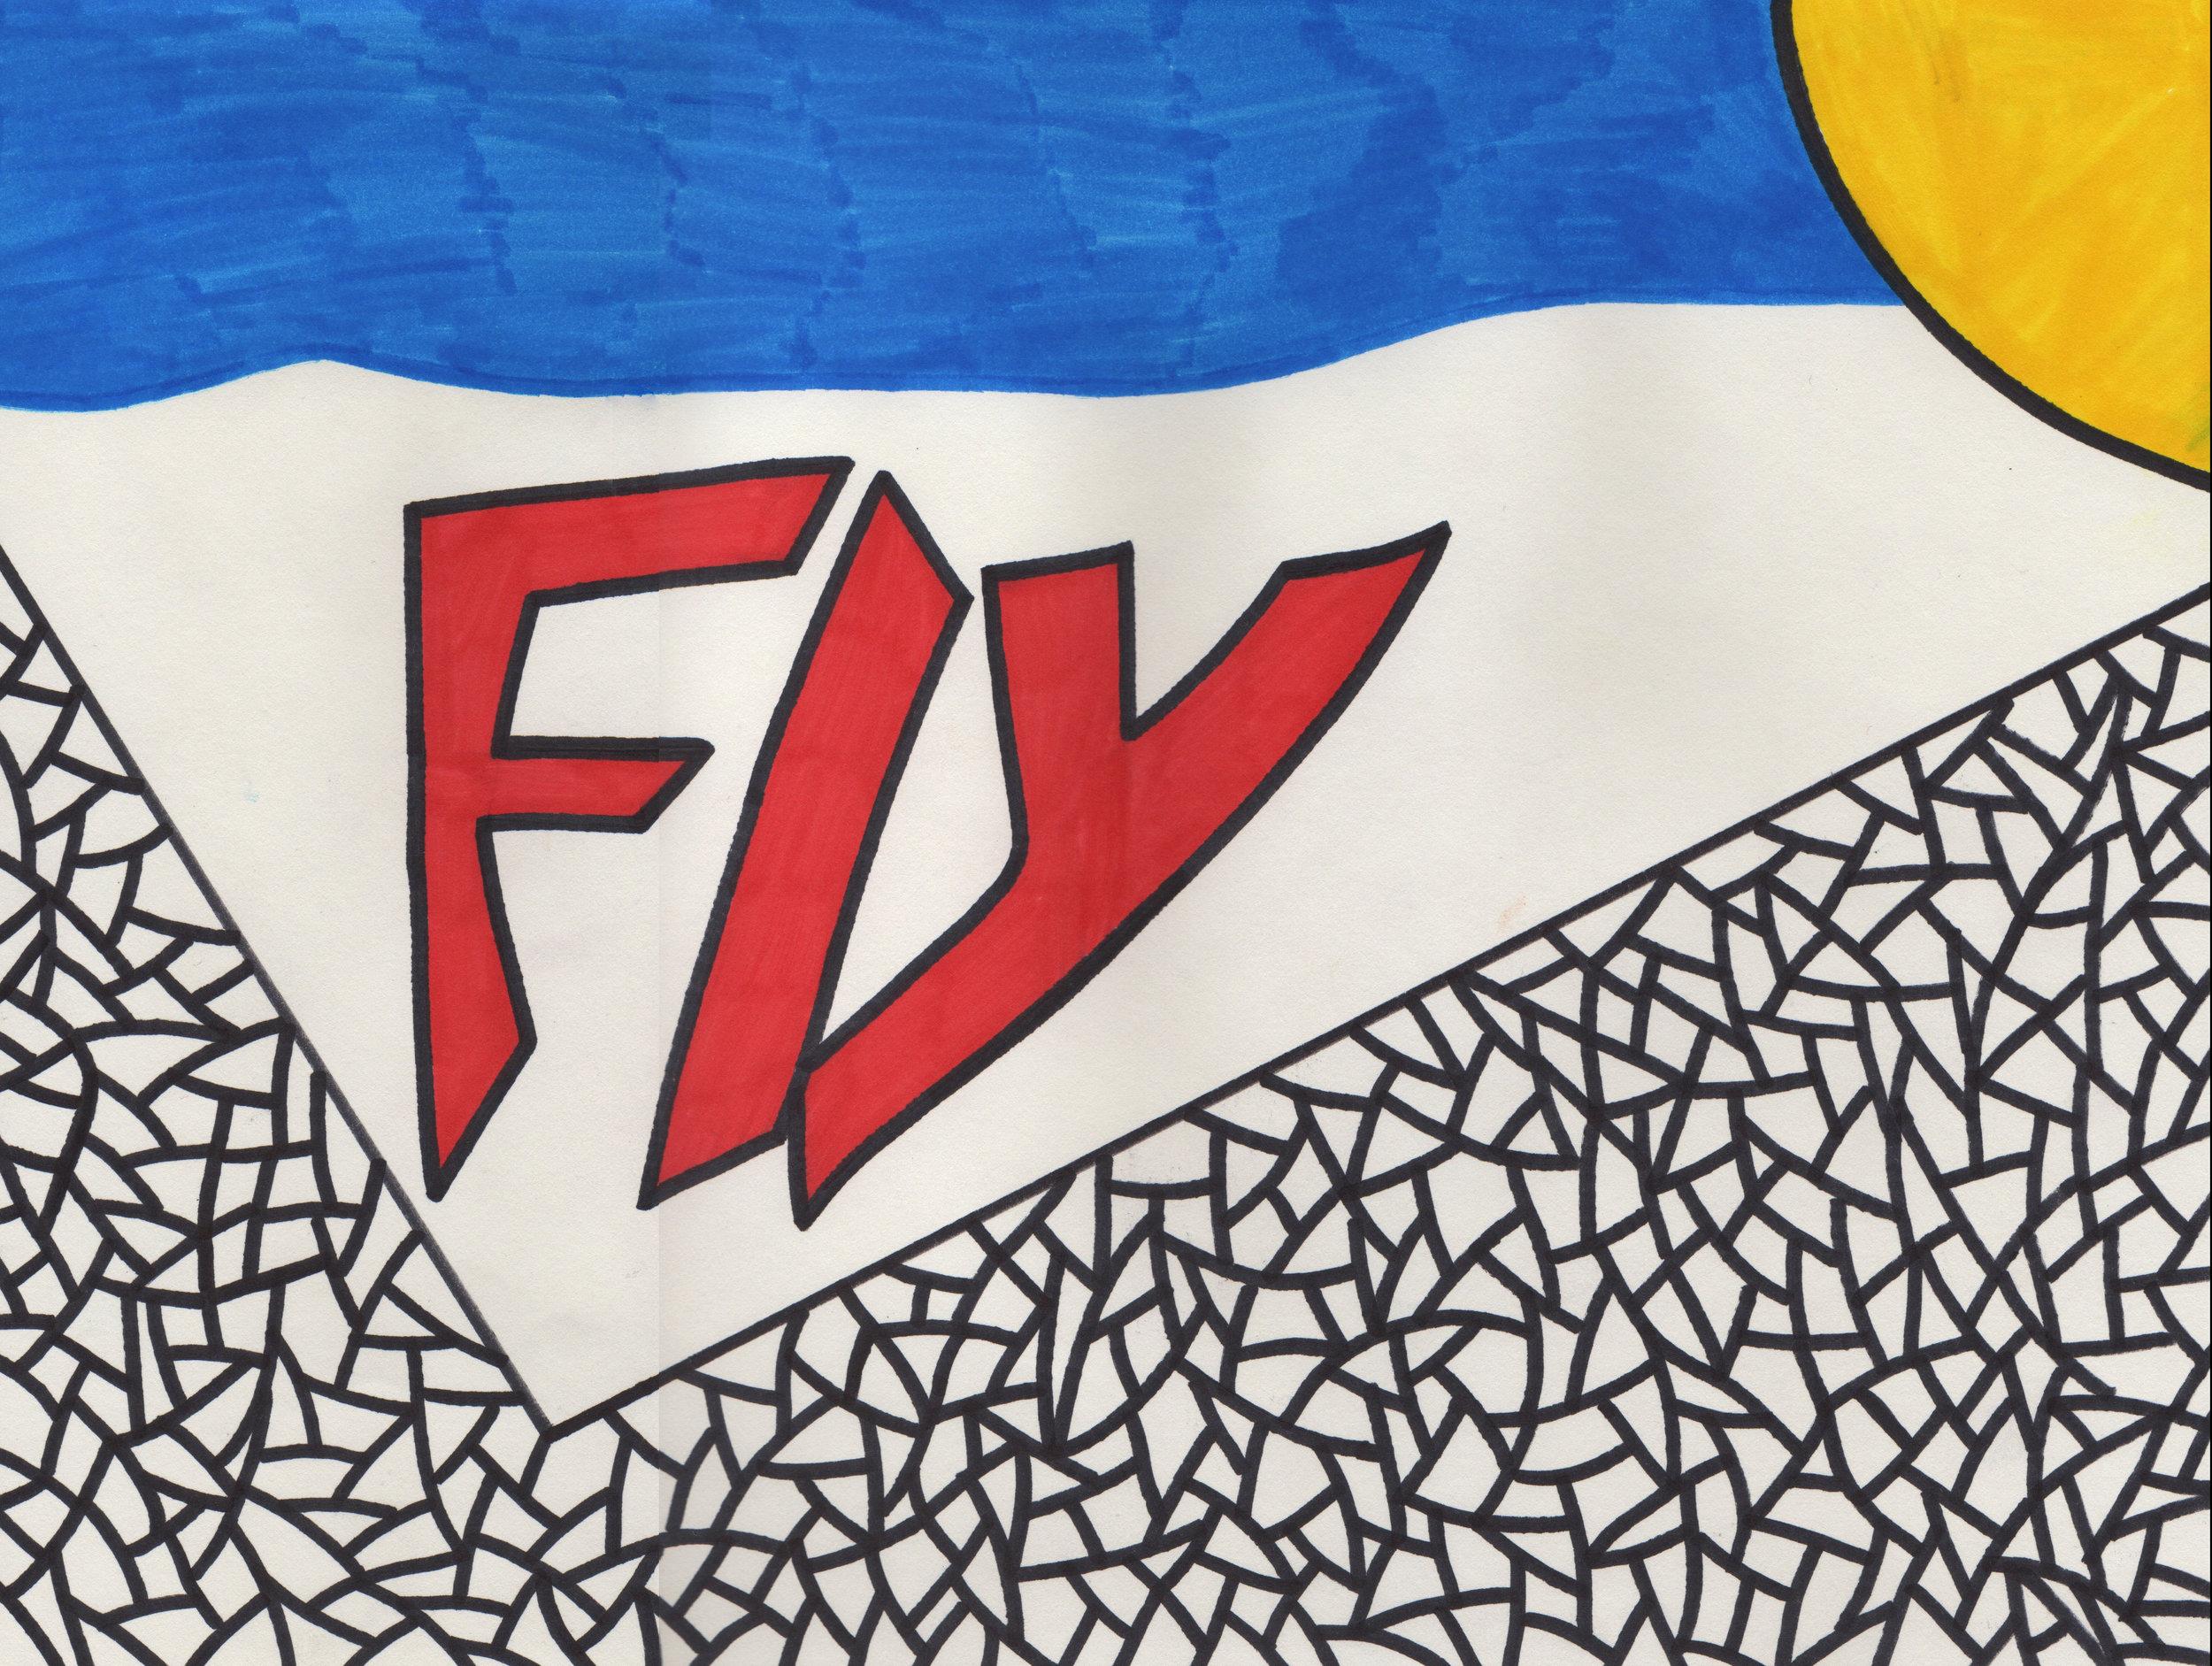 FLY copy.jpg